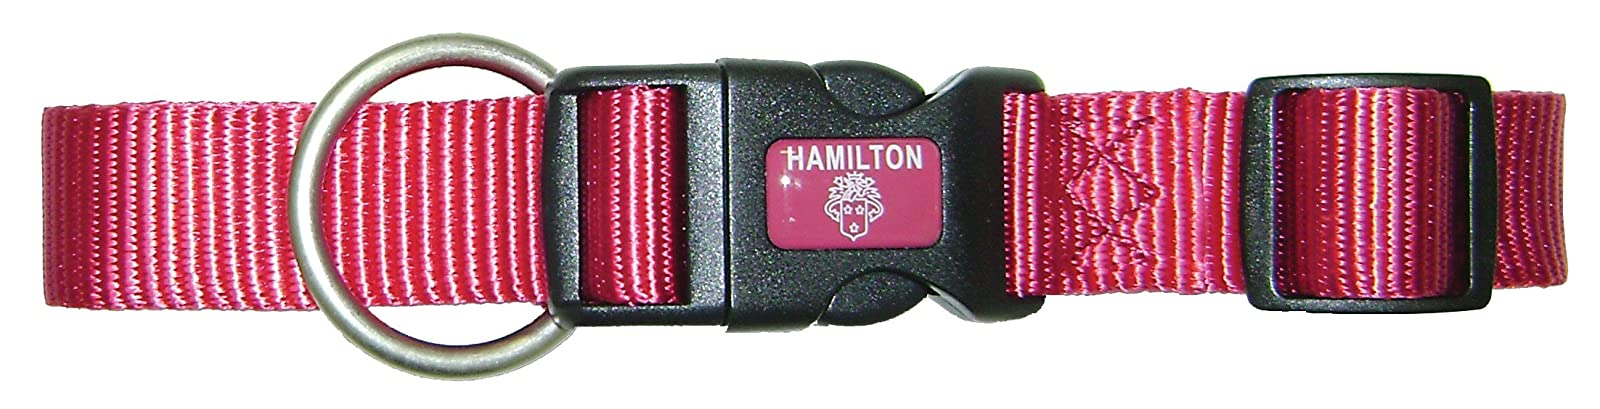 Hamilton Adjustable Dog Collar with Brushed Hardware B FAL 18/26 RS - 2